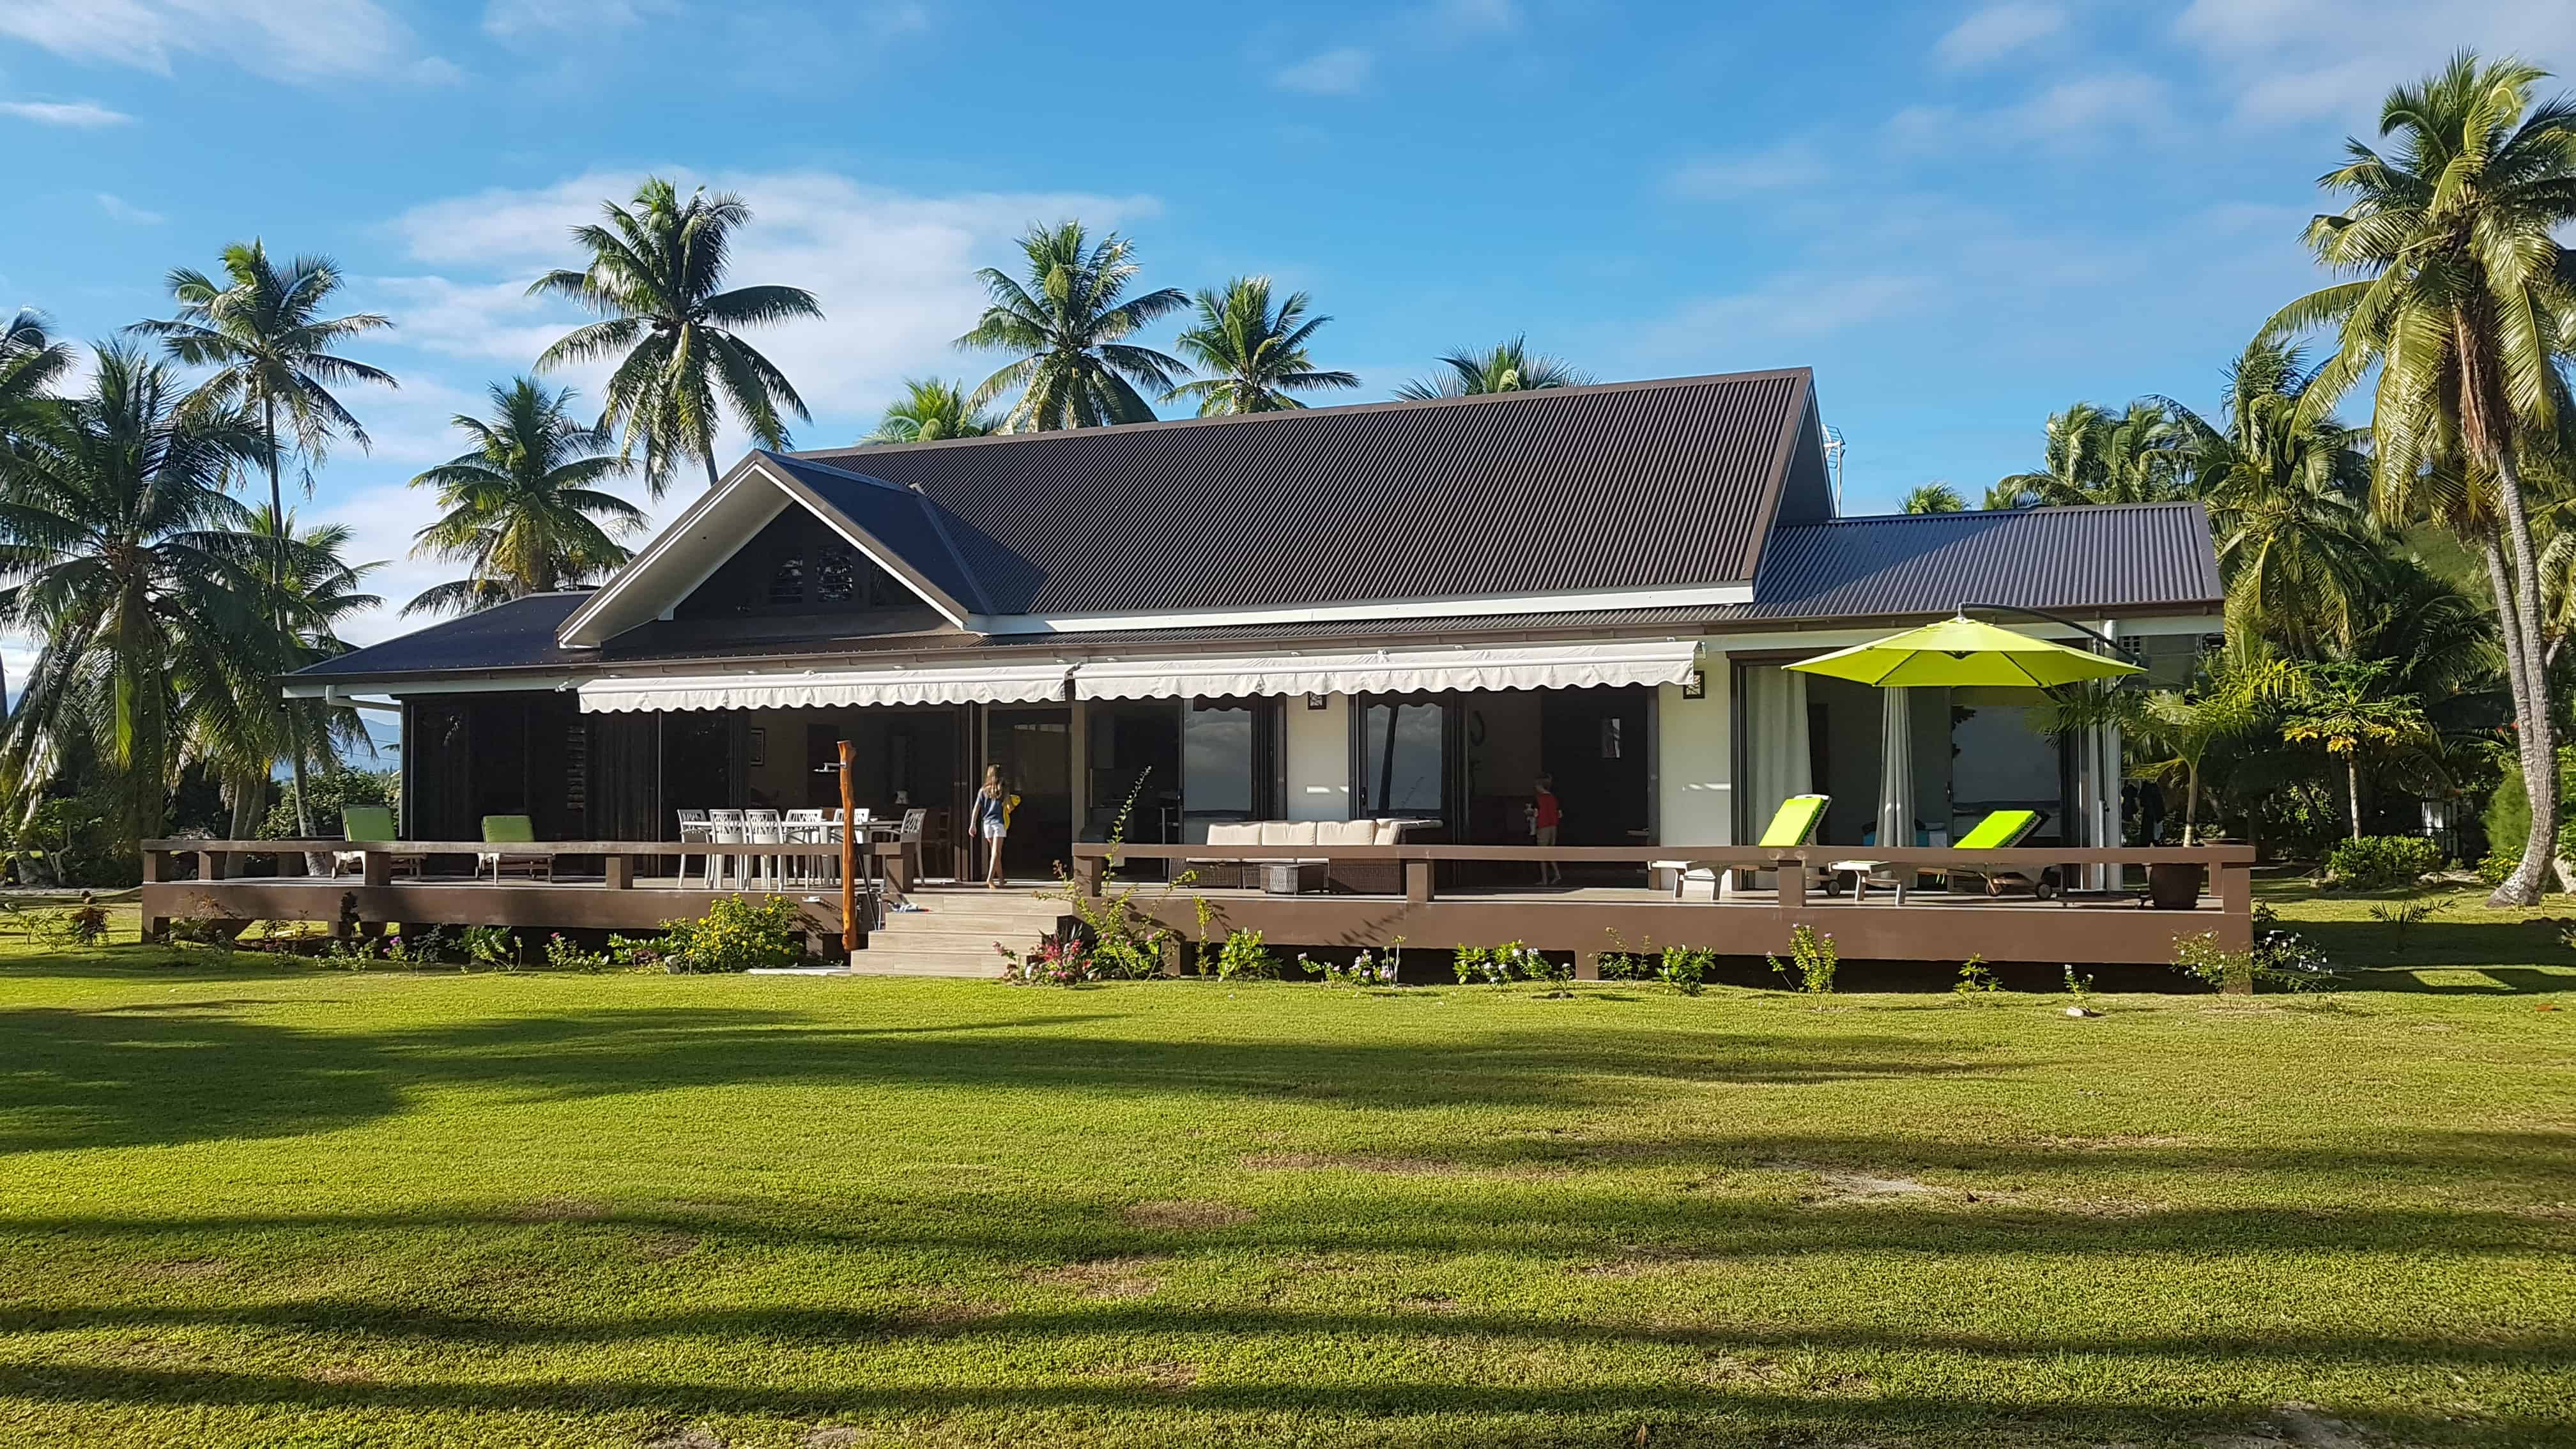 https://tahititourisme.be/wp-content/uploads/2018/09/Villa-Tiarenui-by-Tahiti-Homes-®-a-Moorea-4.jpg